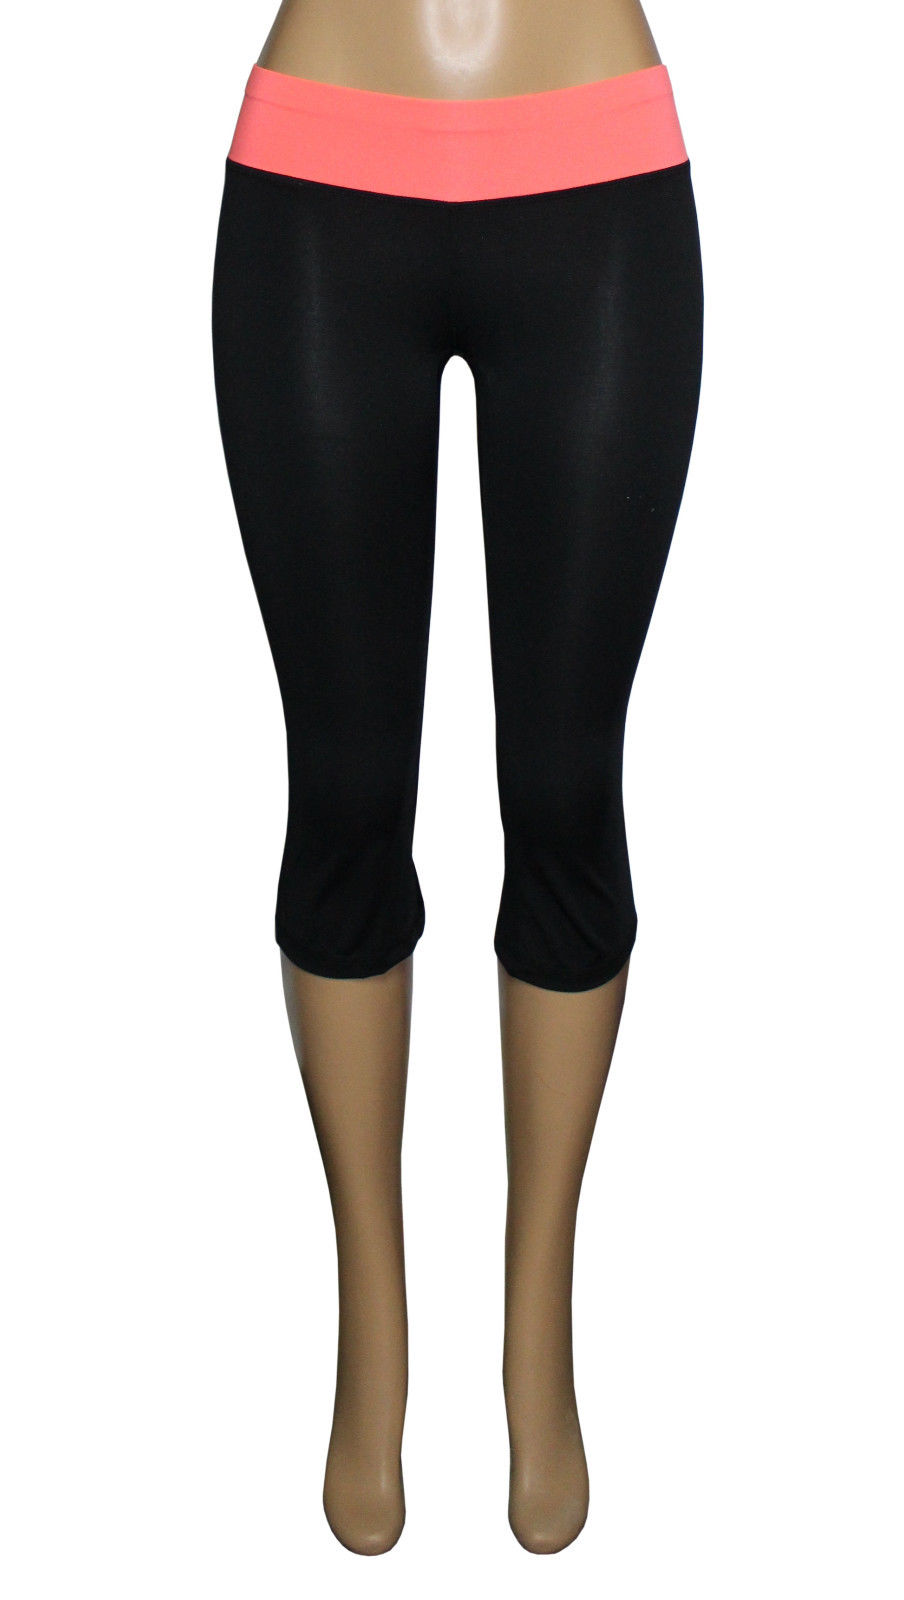 W Sportu00ae Womenu0026#39;s Moisture Wick Skinny Athletic Yoga Capri Leggings 811 | eBay